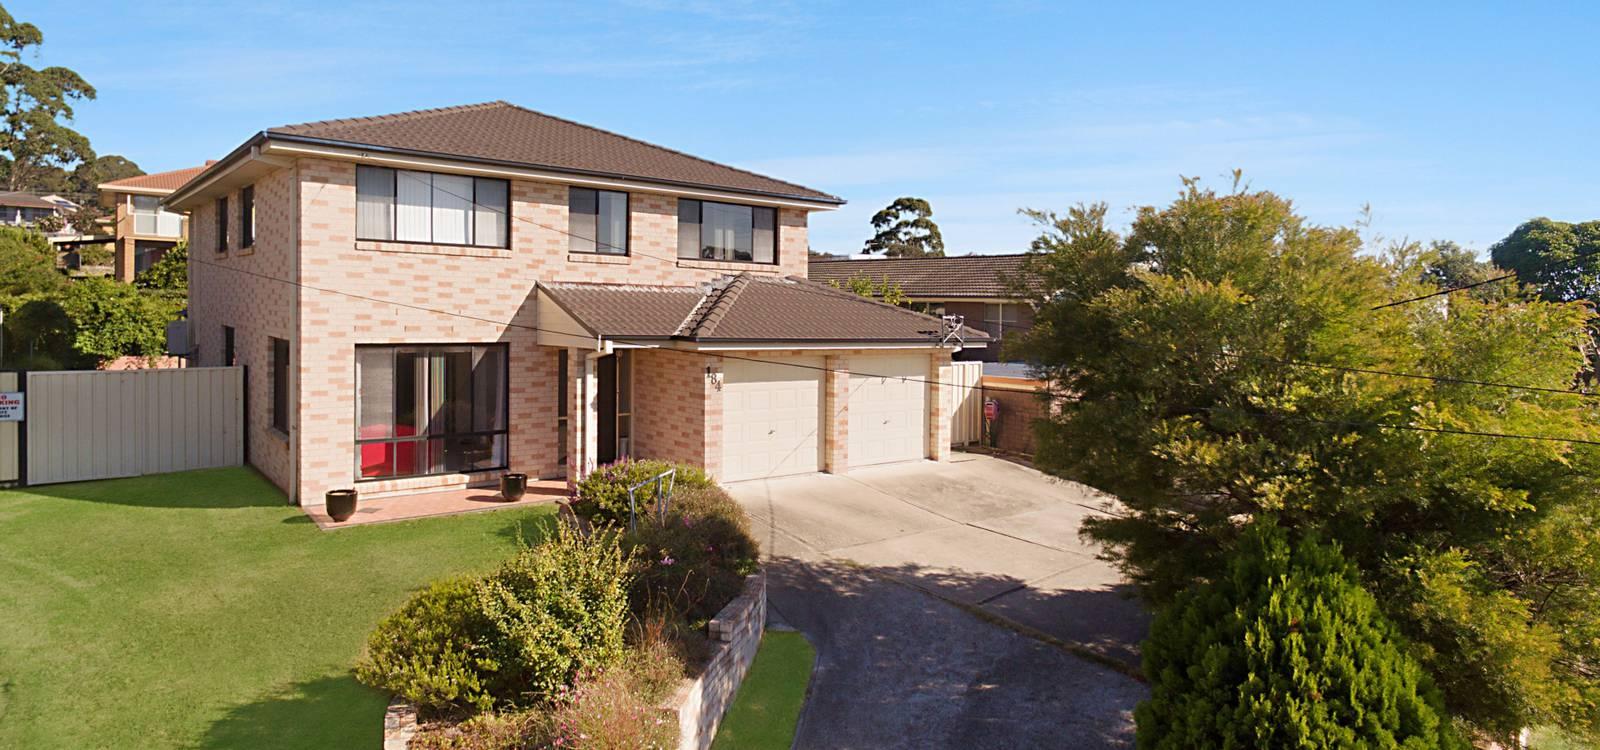 184 Monash Avenue TUROSS HEAD, NSW 2537 - photo 1